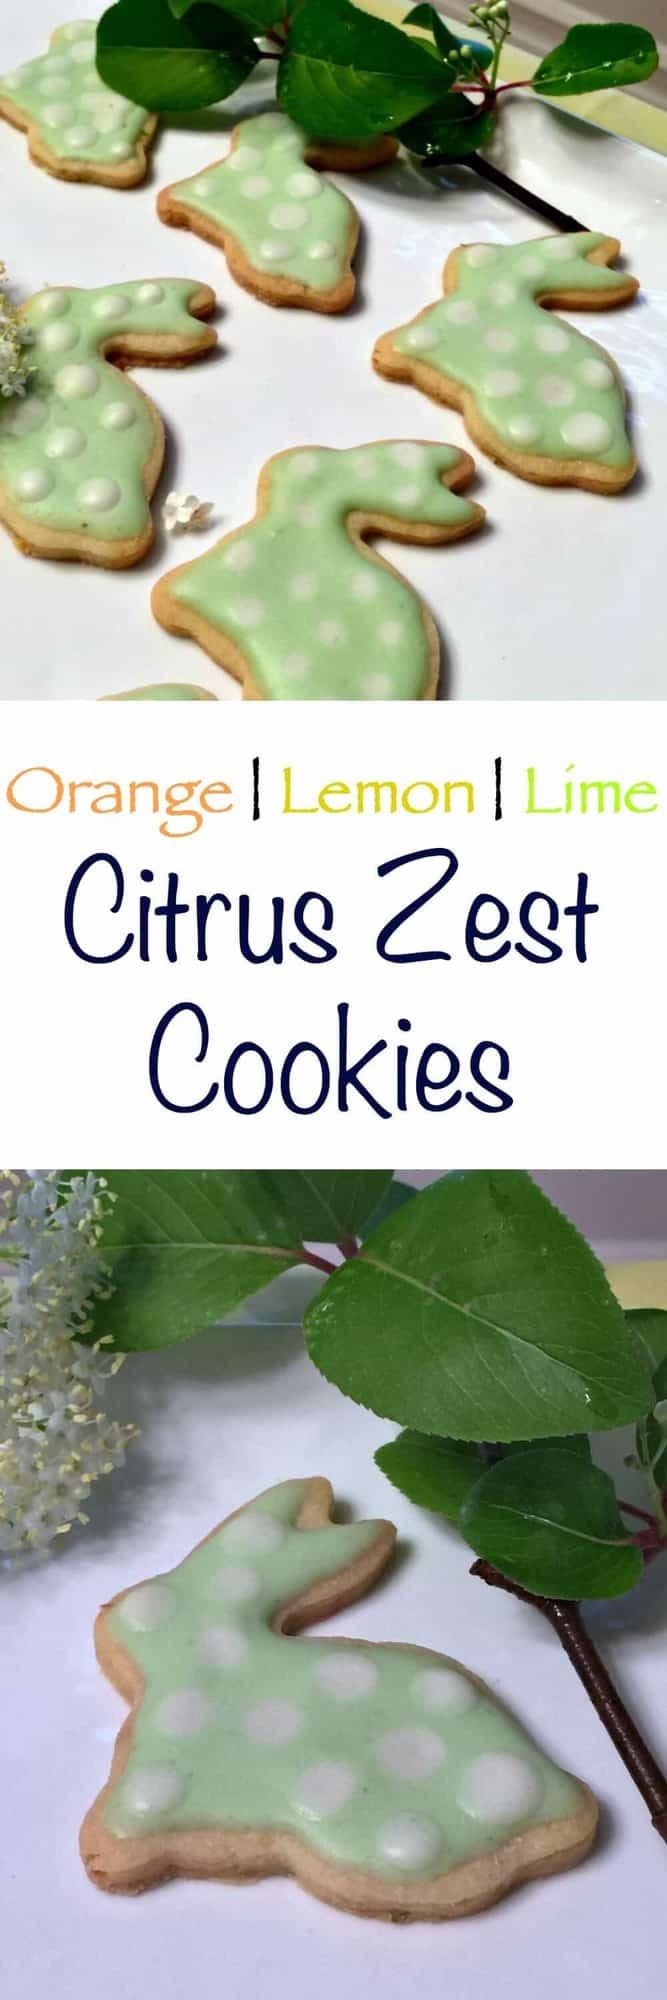 Citrus Zest Cookies - Orange Lemon and Lime butter cookies